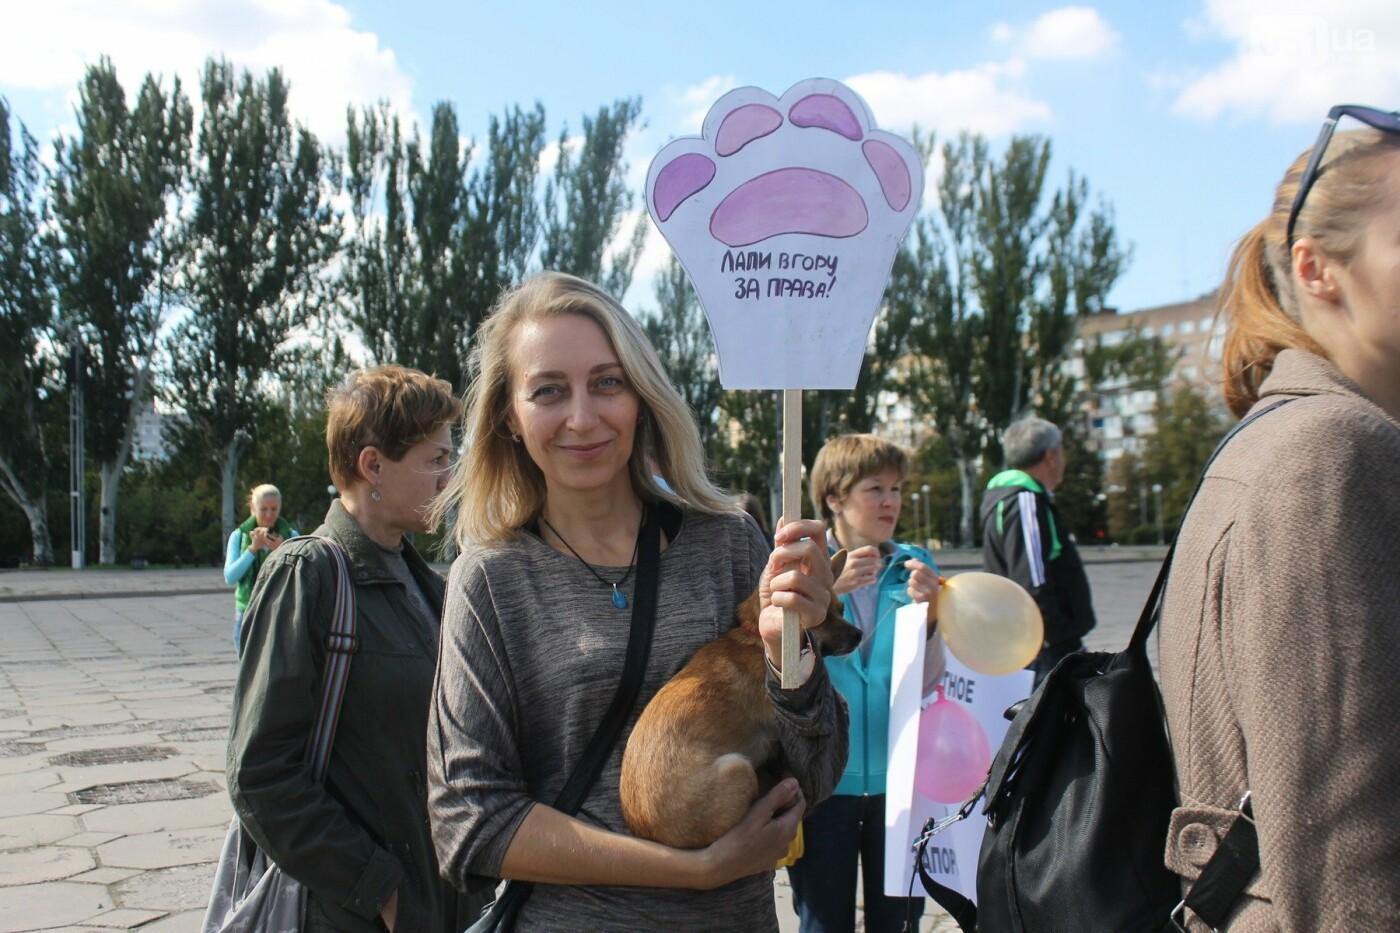 «Защити! Не мучай»: в Запорожье провели марш за права животных, – ФОТОРЕПОРТАЖ, ВИДЕО, фото-12